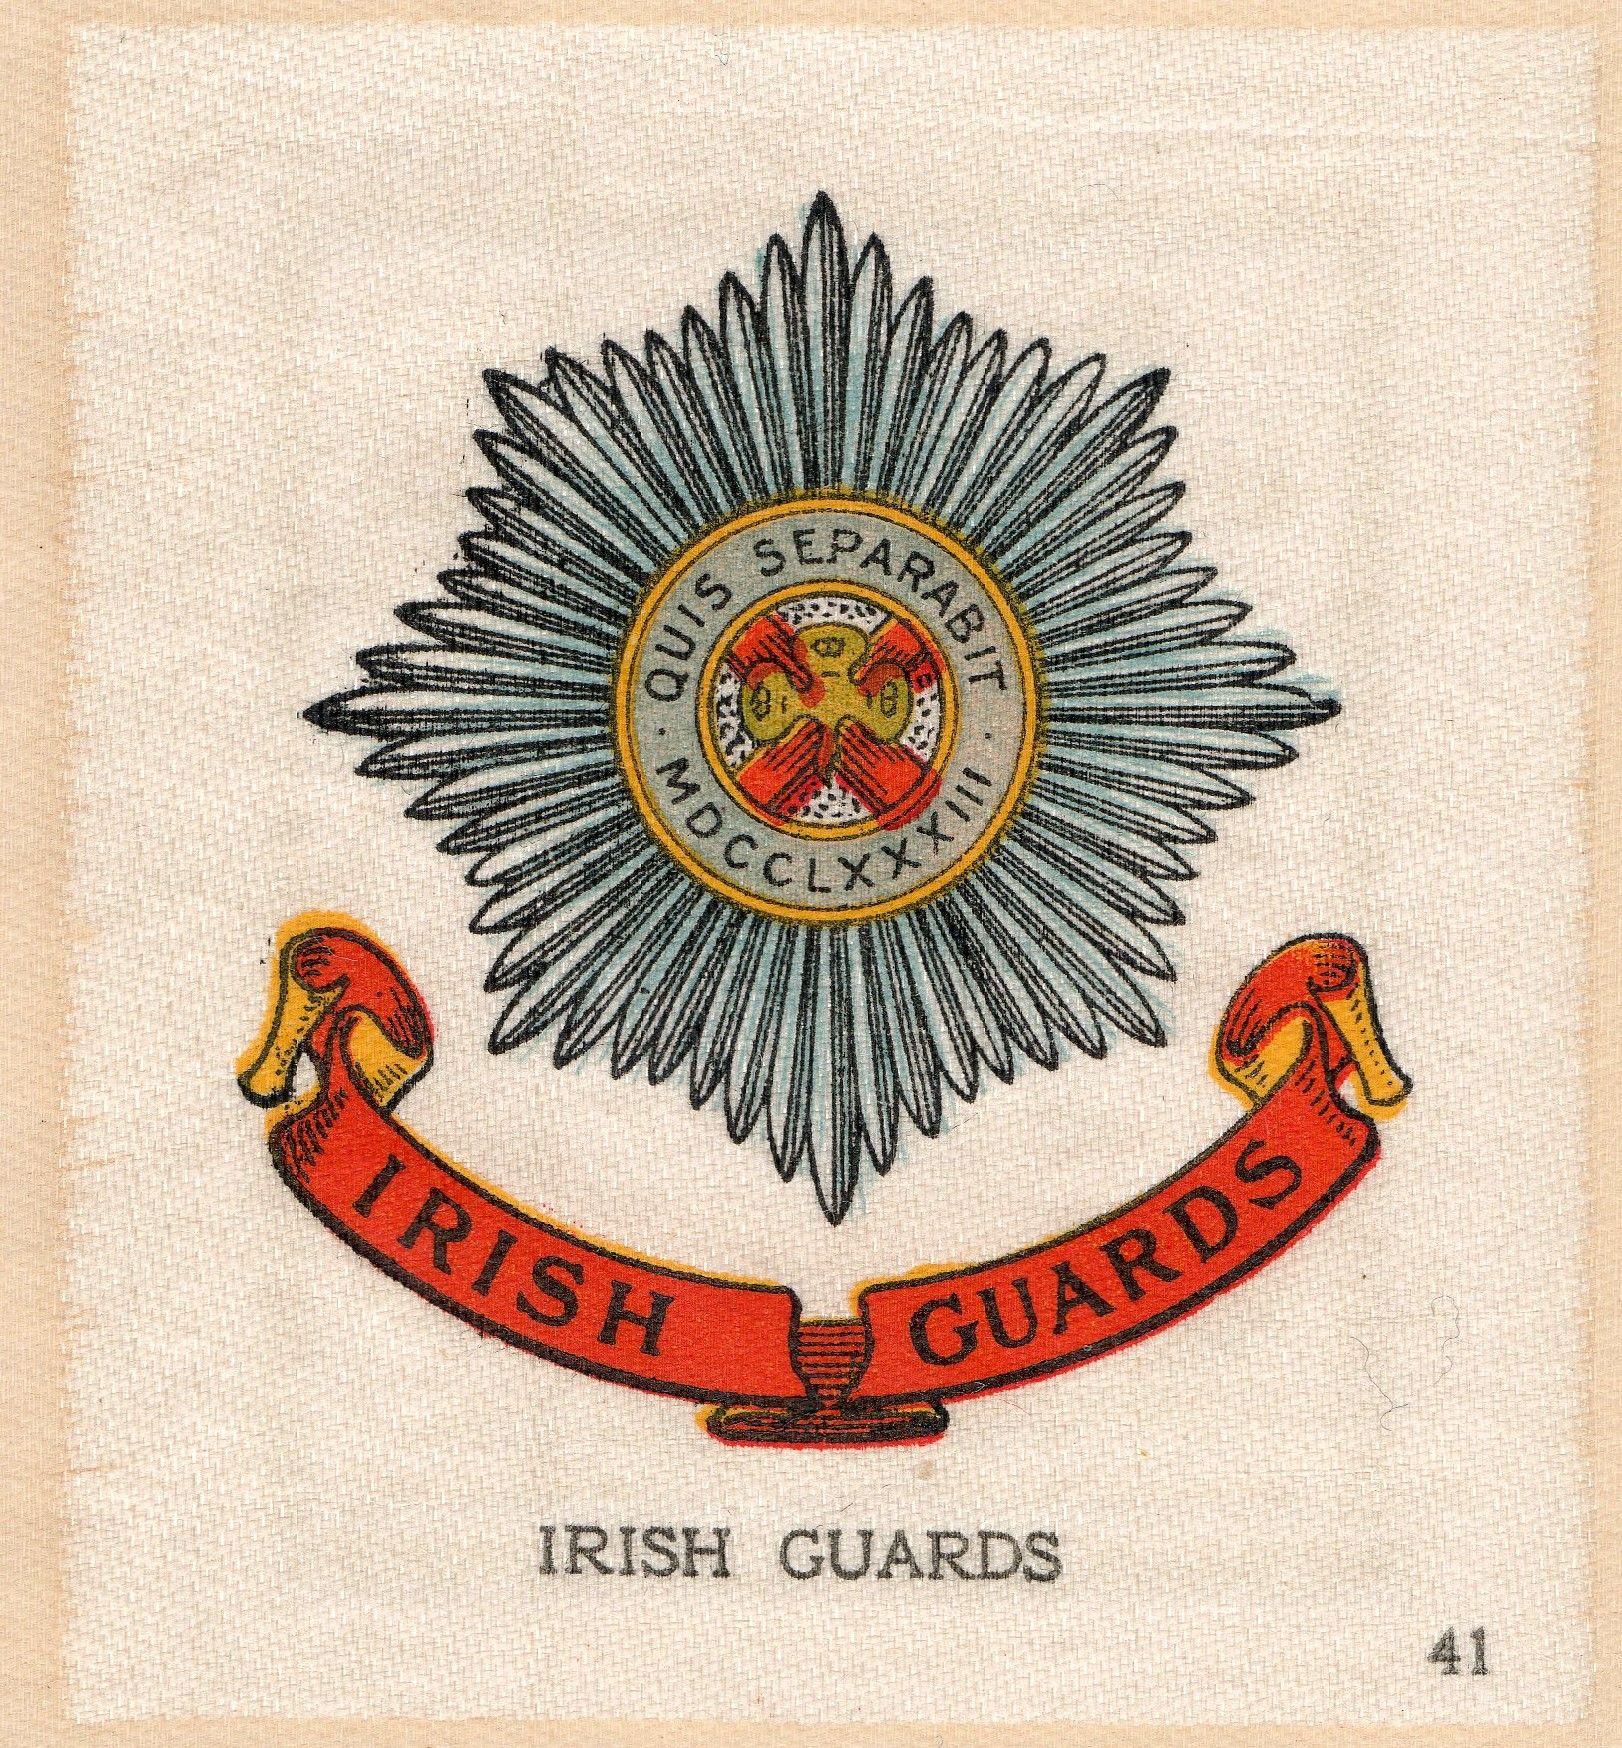 Irish guards british army flag colors modern warfare